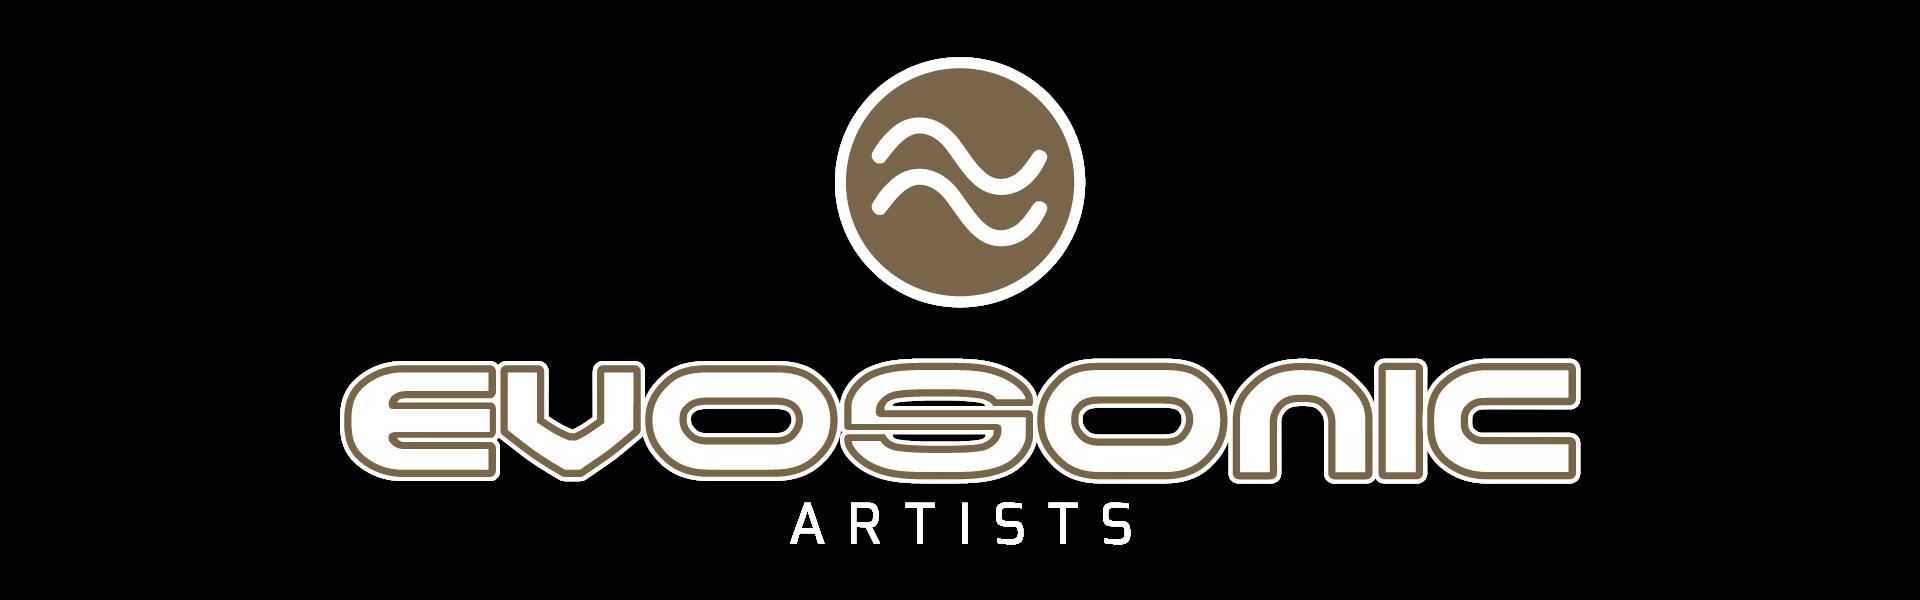 Evosonic-Records-Artists